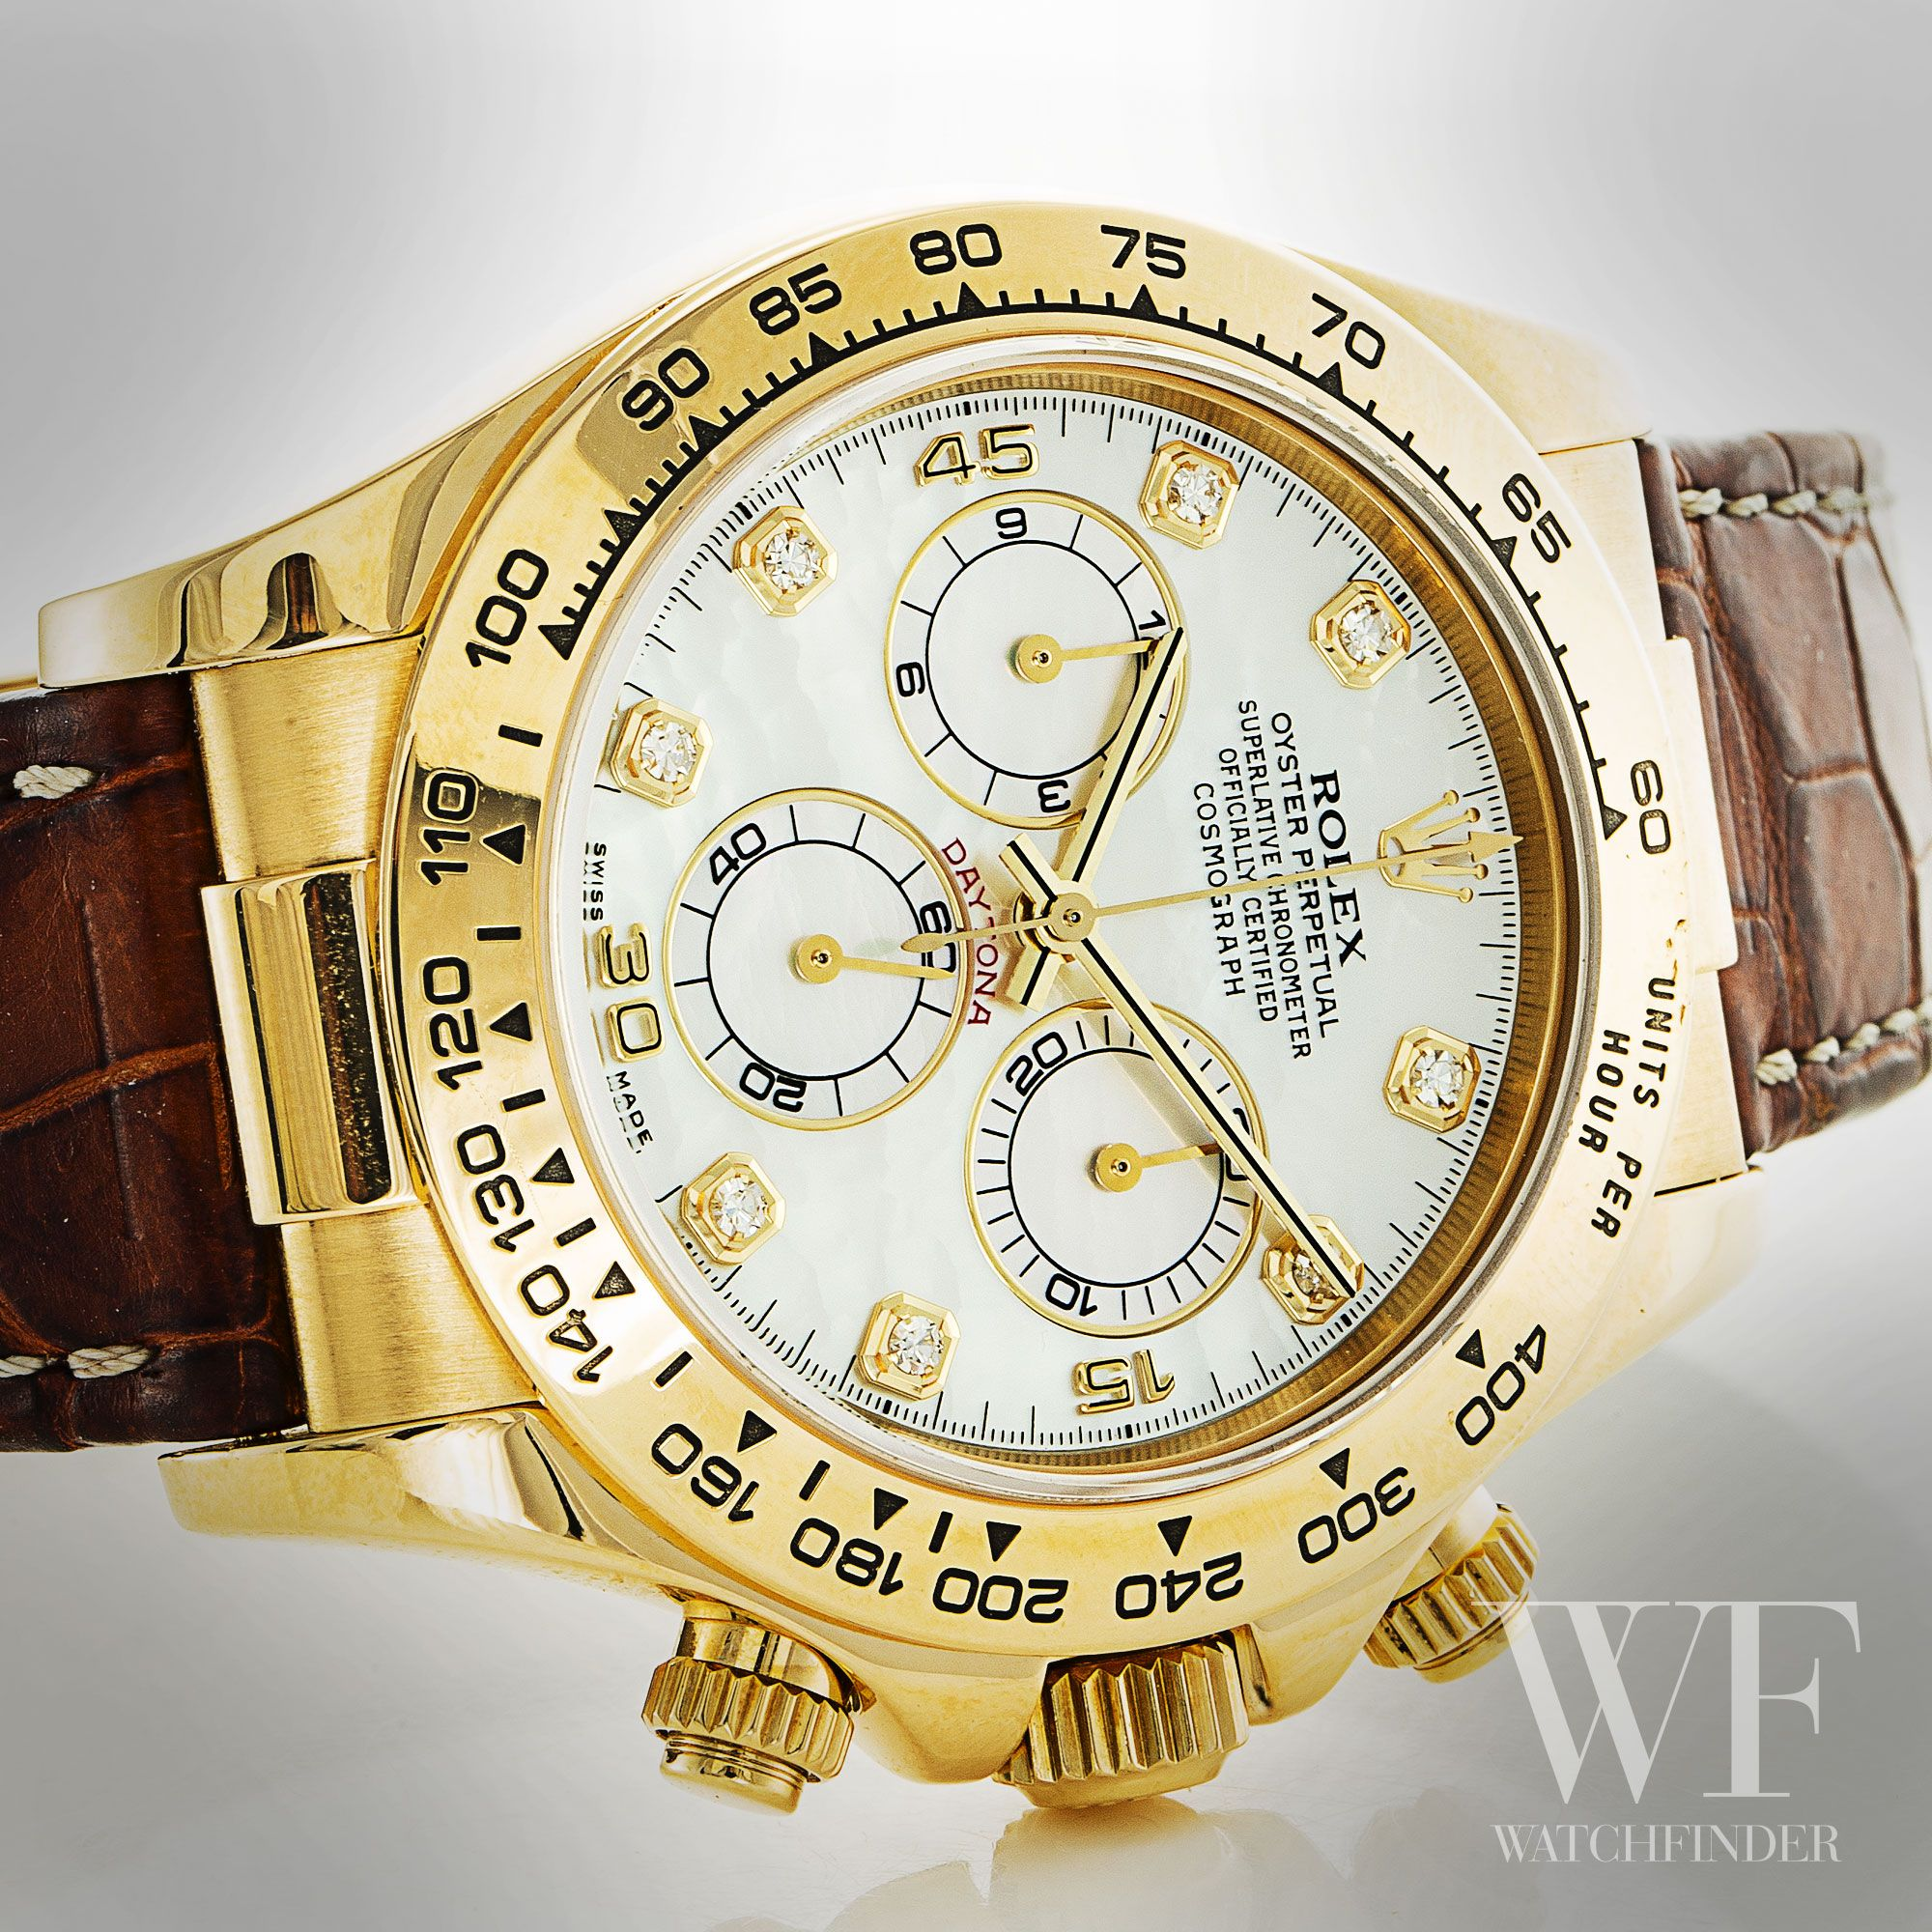 Rolex Daytona 116518 Racingchronograph Automatic Watchfinder